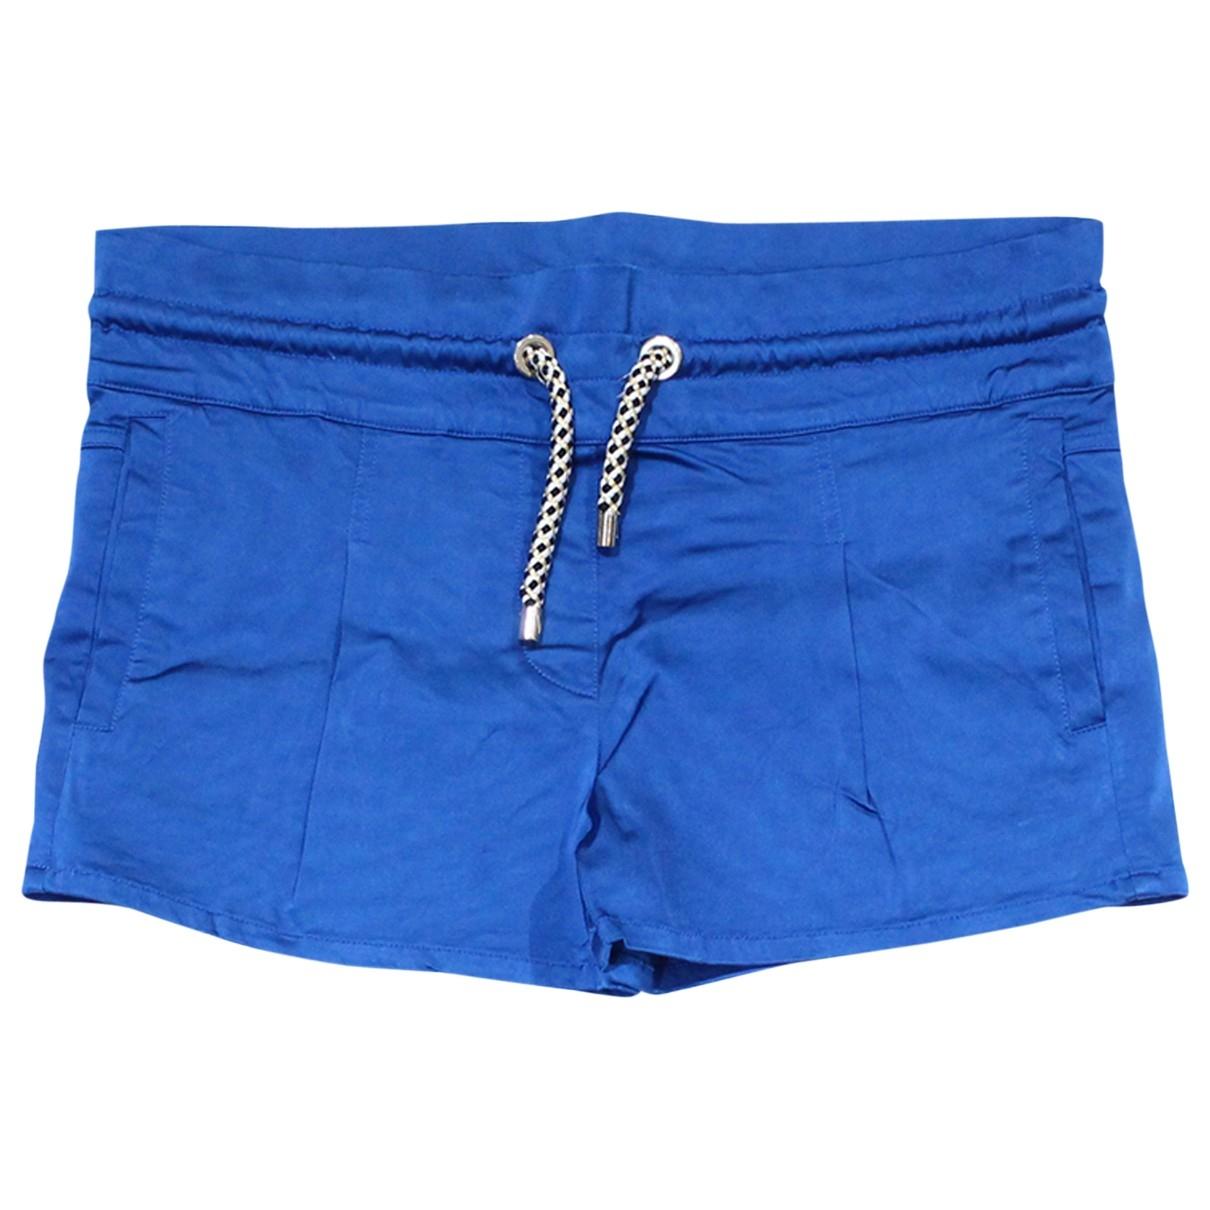 Versace Jeans \N Blue Shorts for Women 36 IT